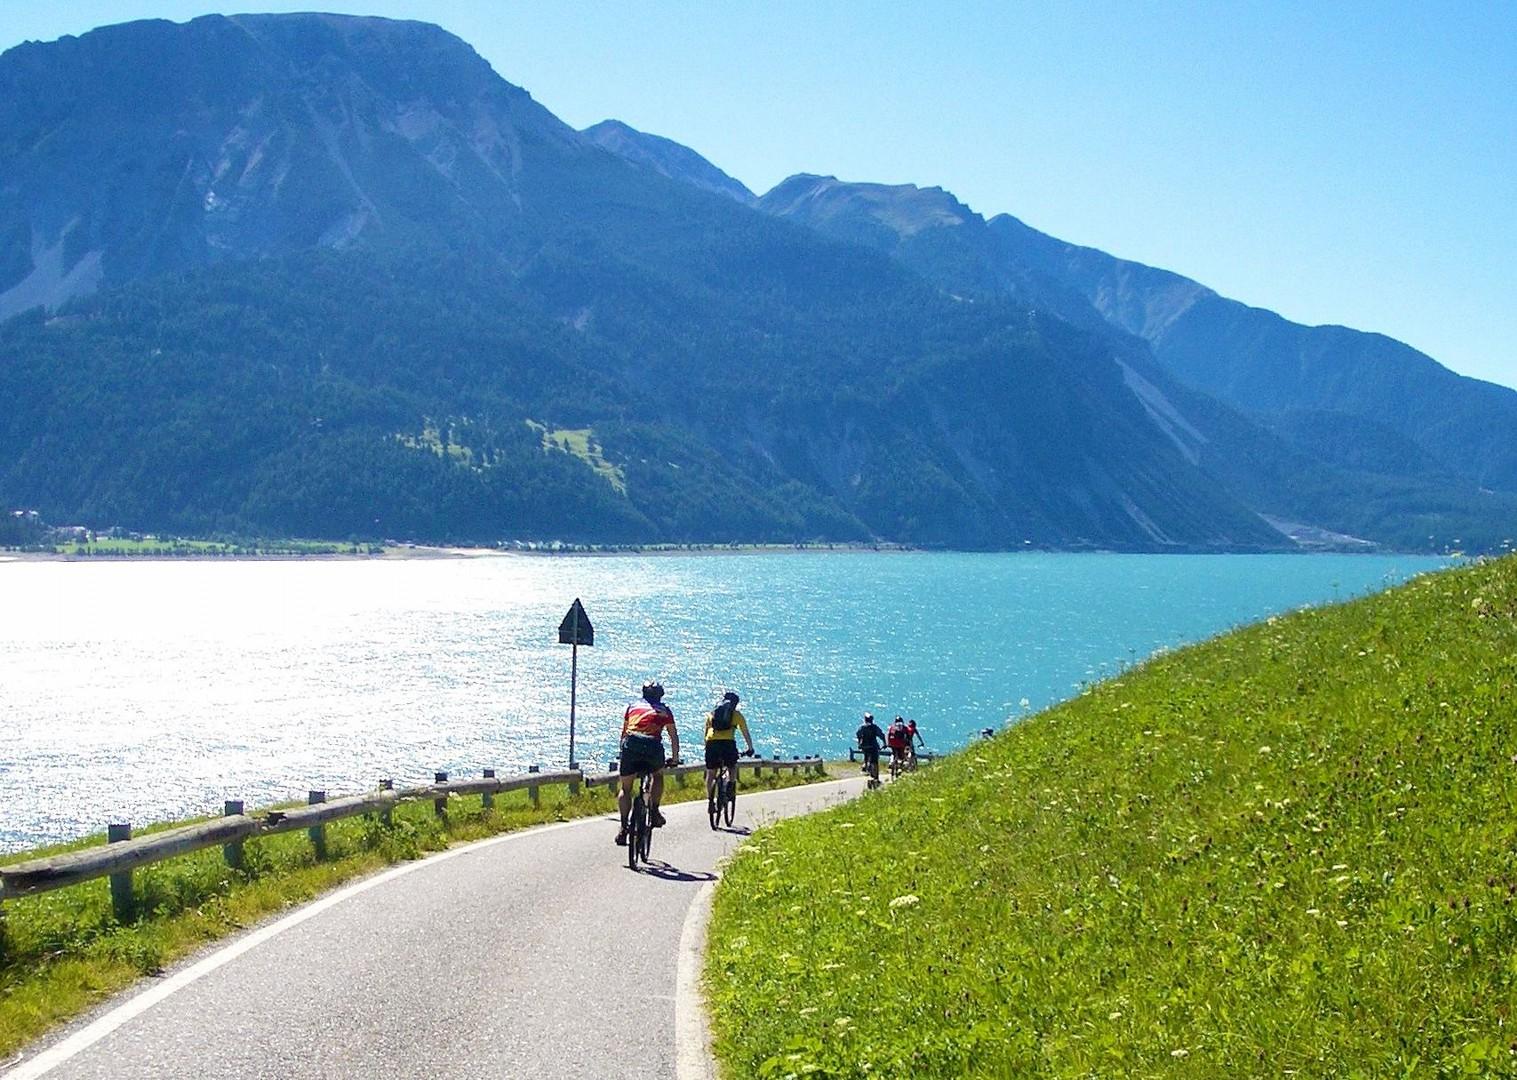 guided-cycling-adventure-la-via-claudia.jpg - Austria and Italy - La Via Claudia - Guided Leisure Cycling Holiday - Leisure Cycling